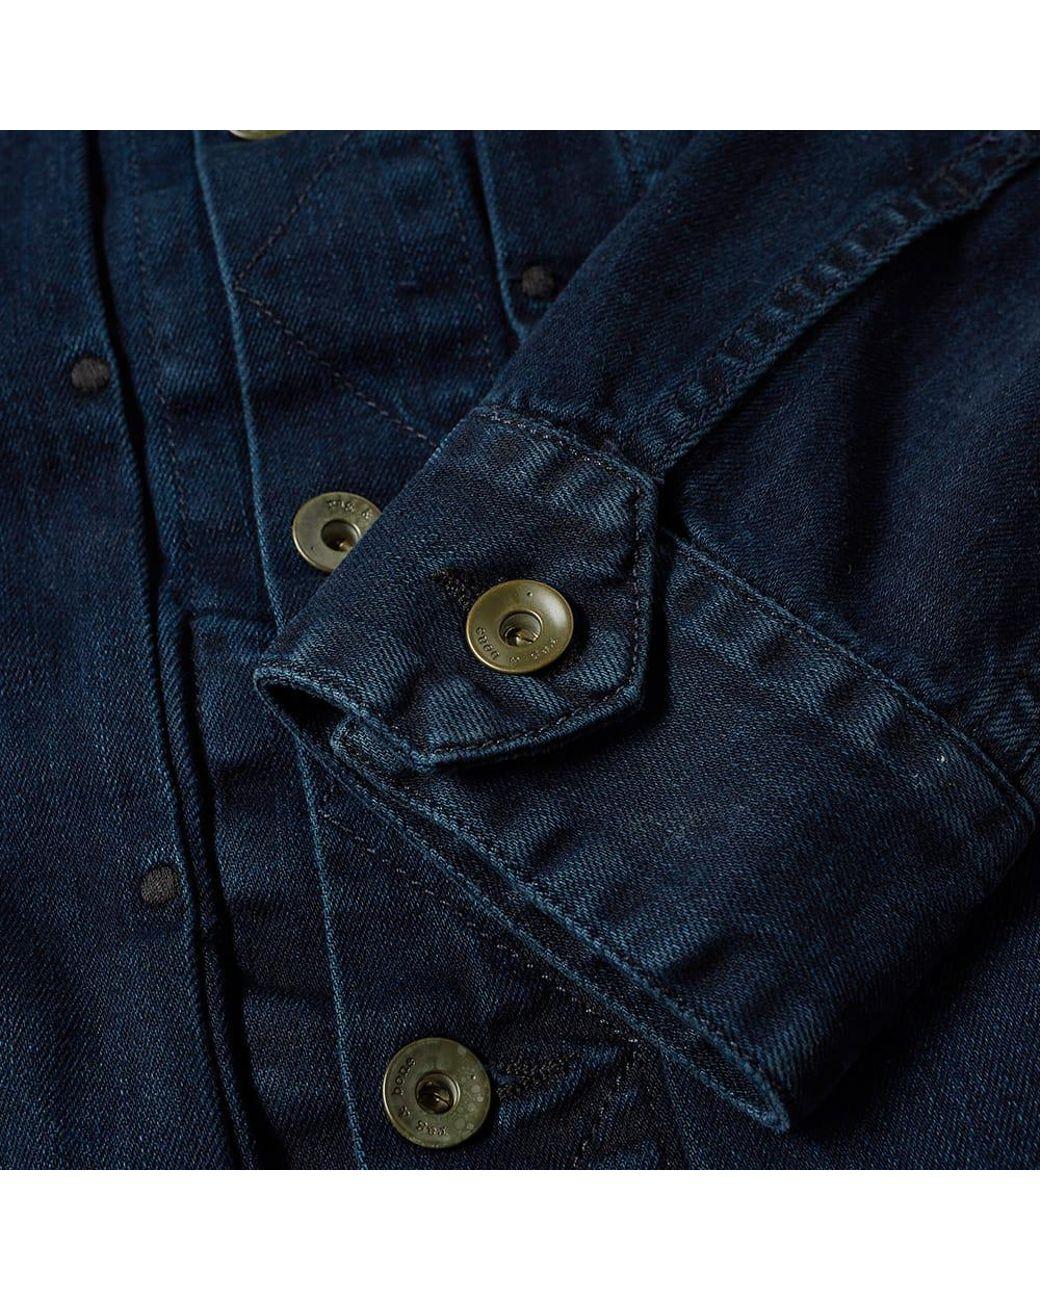 f0d877fe38f9e0 Lyst - Rag   Bone Denim Jacket in Blue for Men - Save 53%